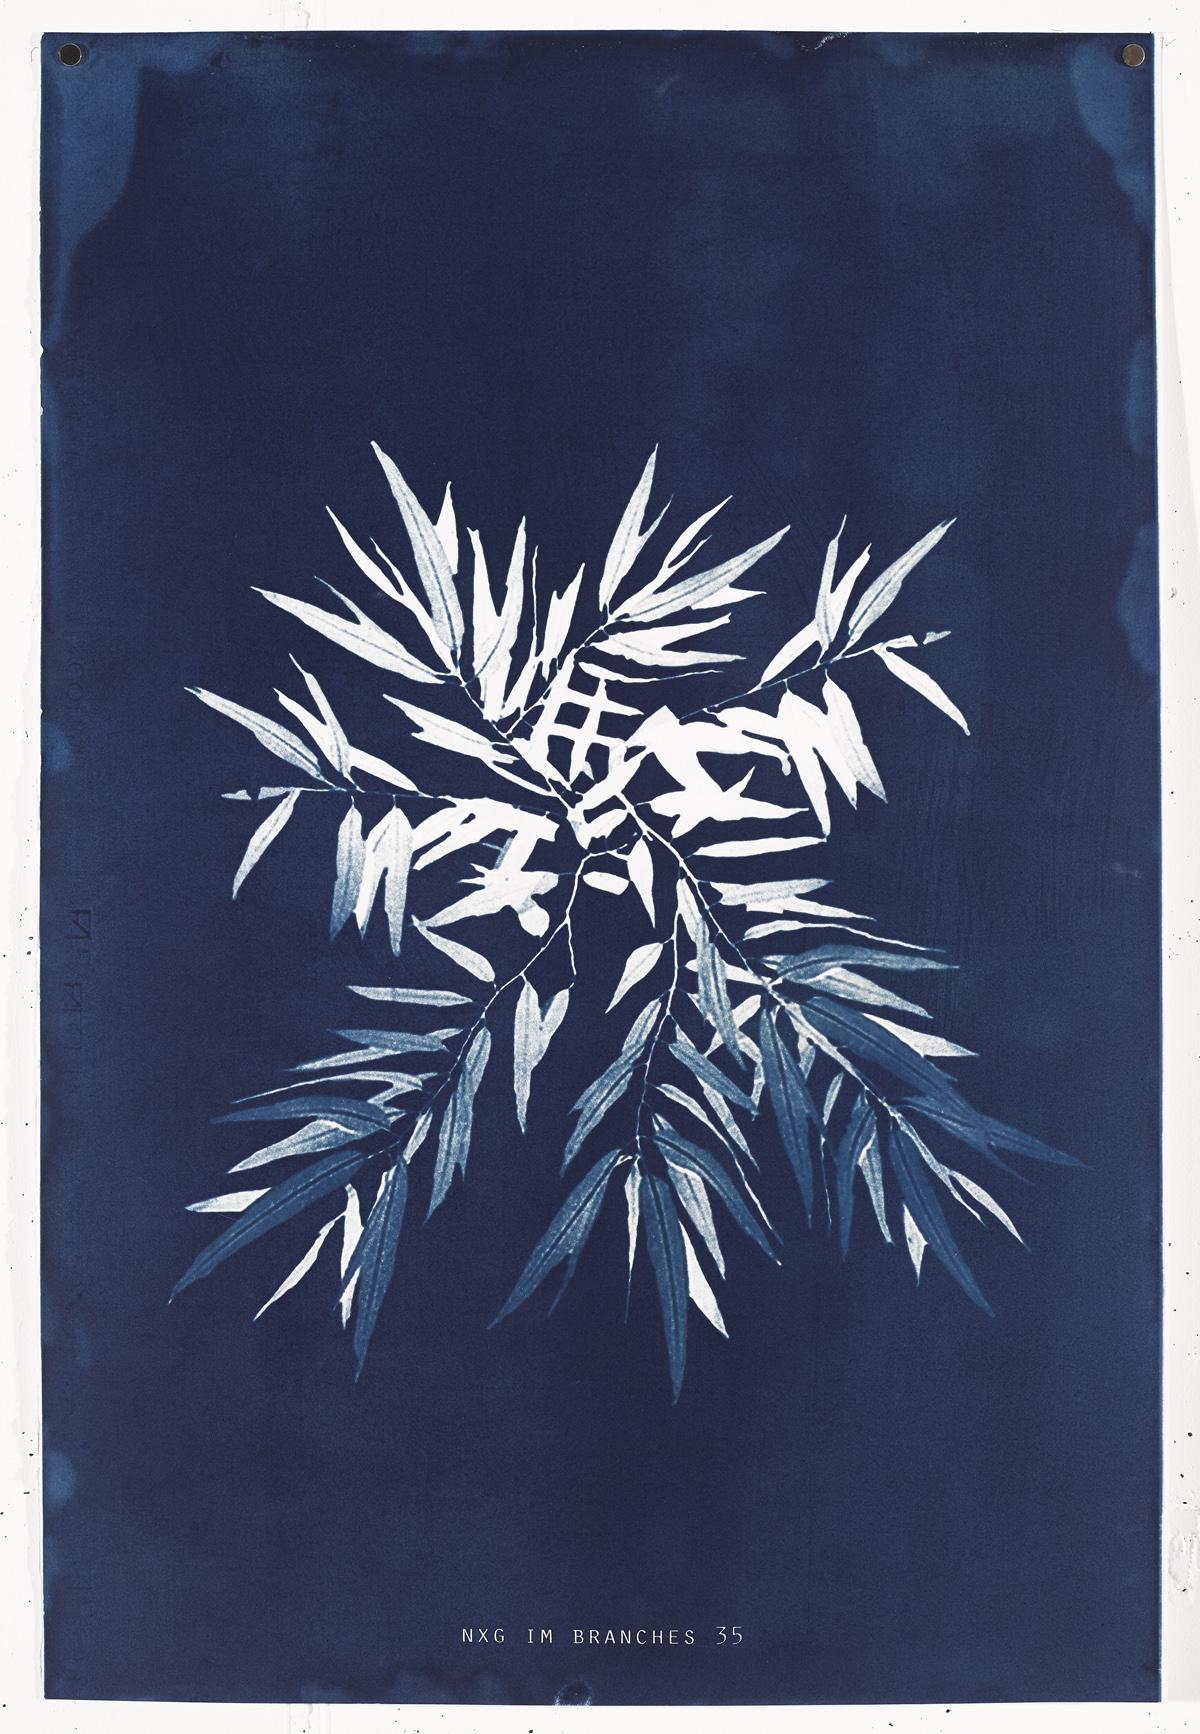 IM BRANCHES 2017 Unique cyanotype print on Frabriano No.5. 90.4cm x 61cm